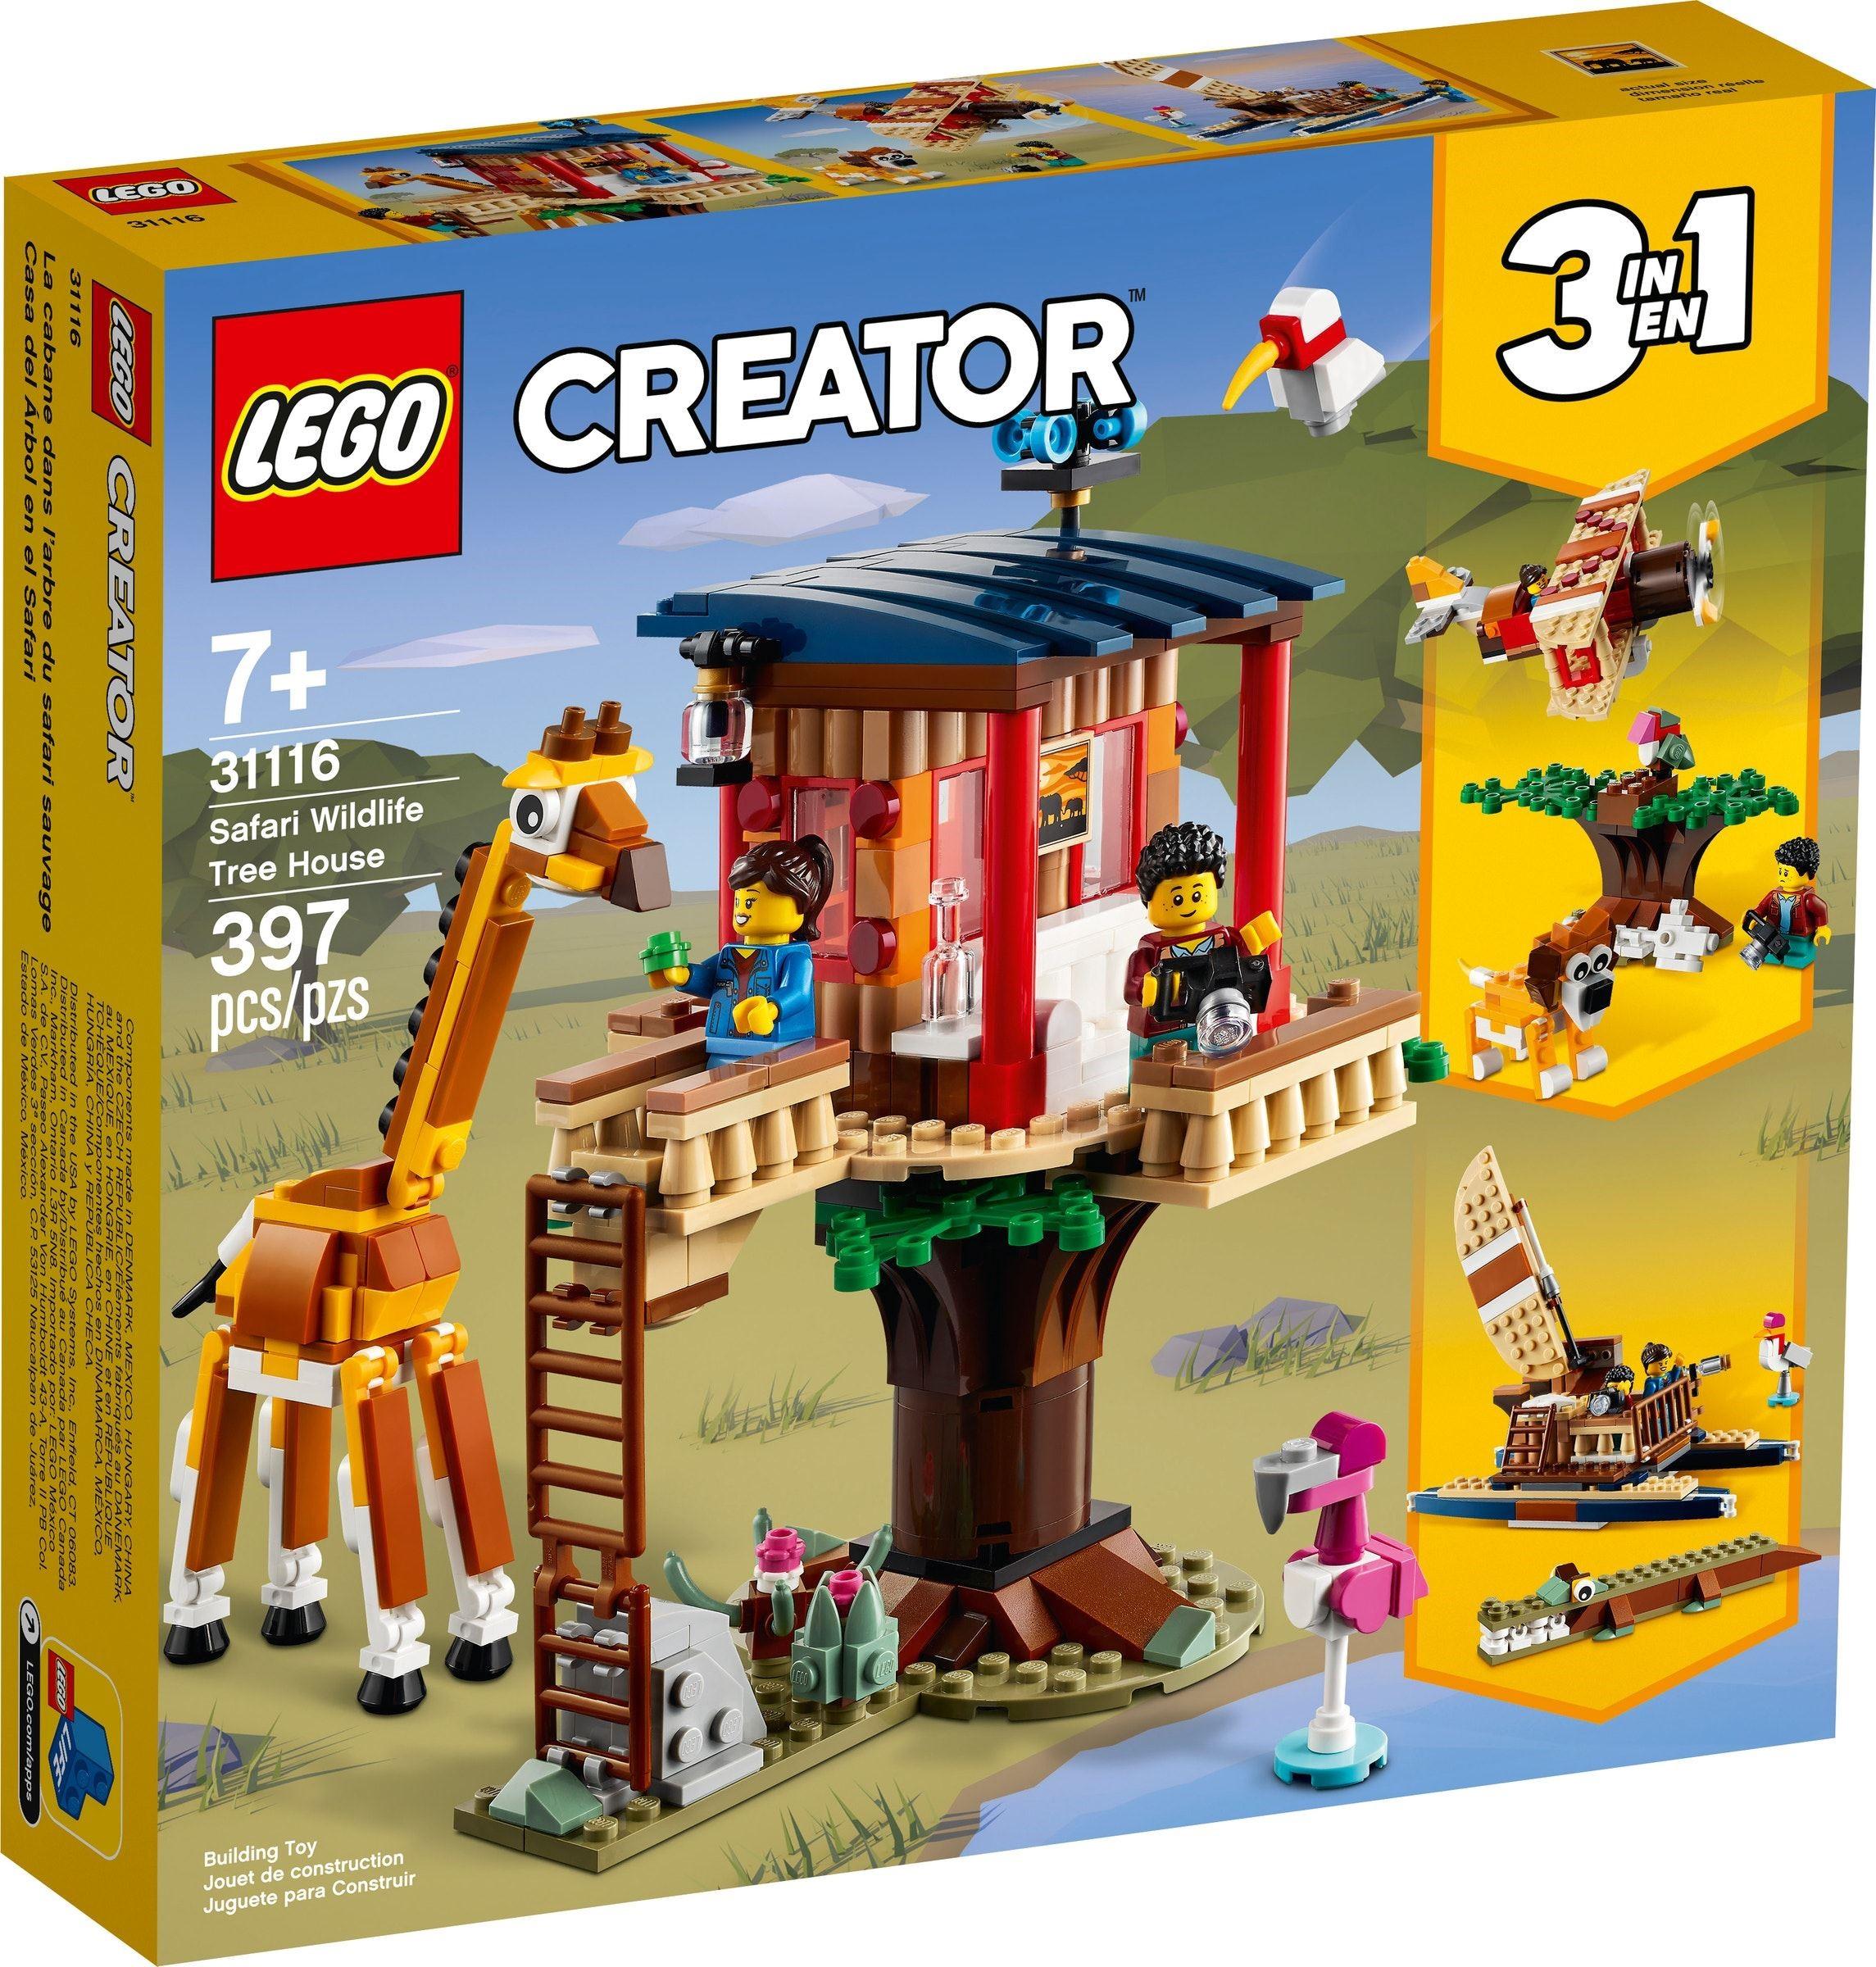 LEGO Creator - Safari Wildlife Tree House (31116)